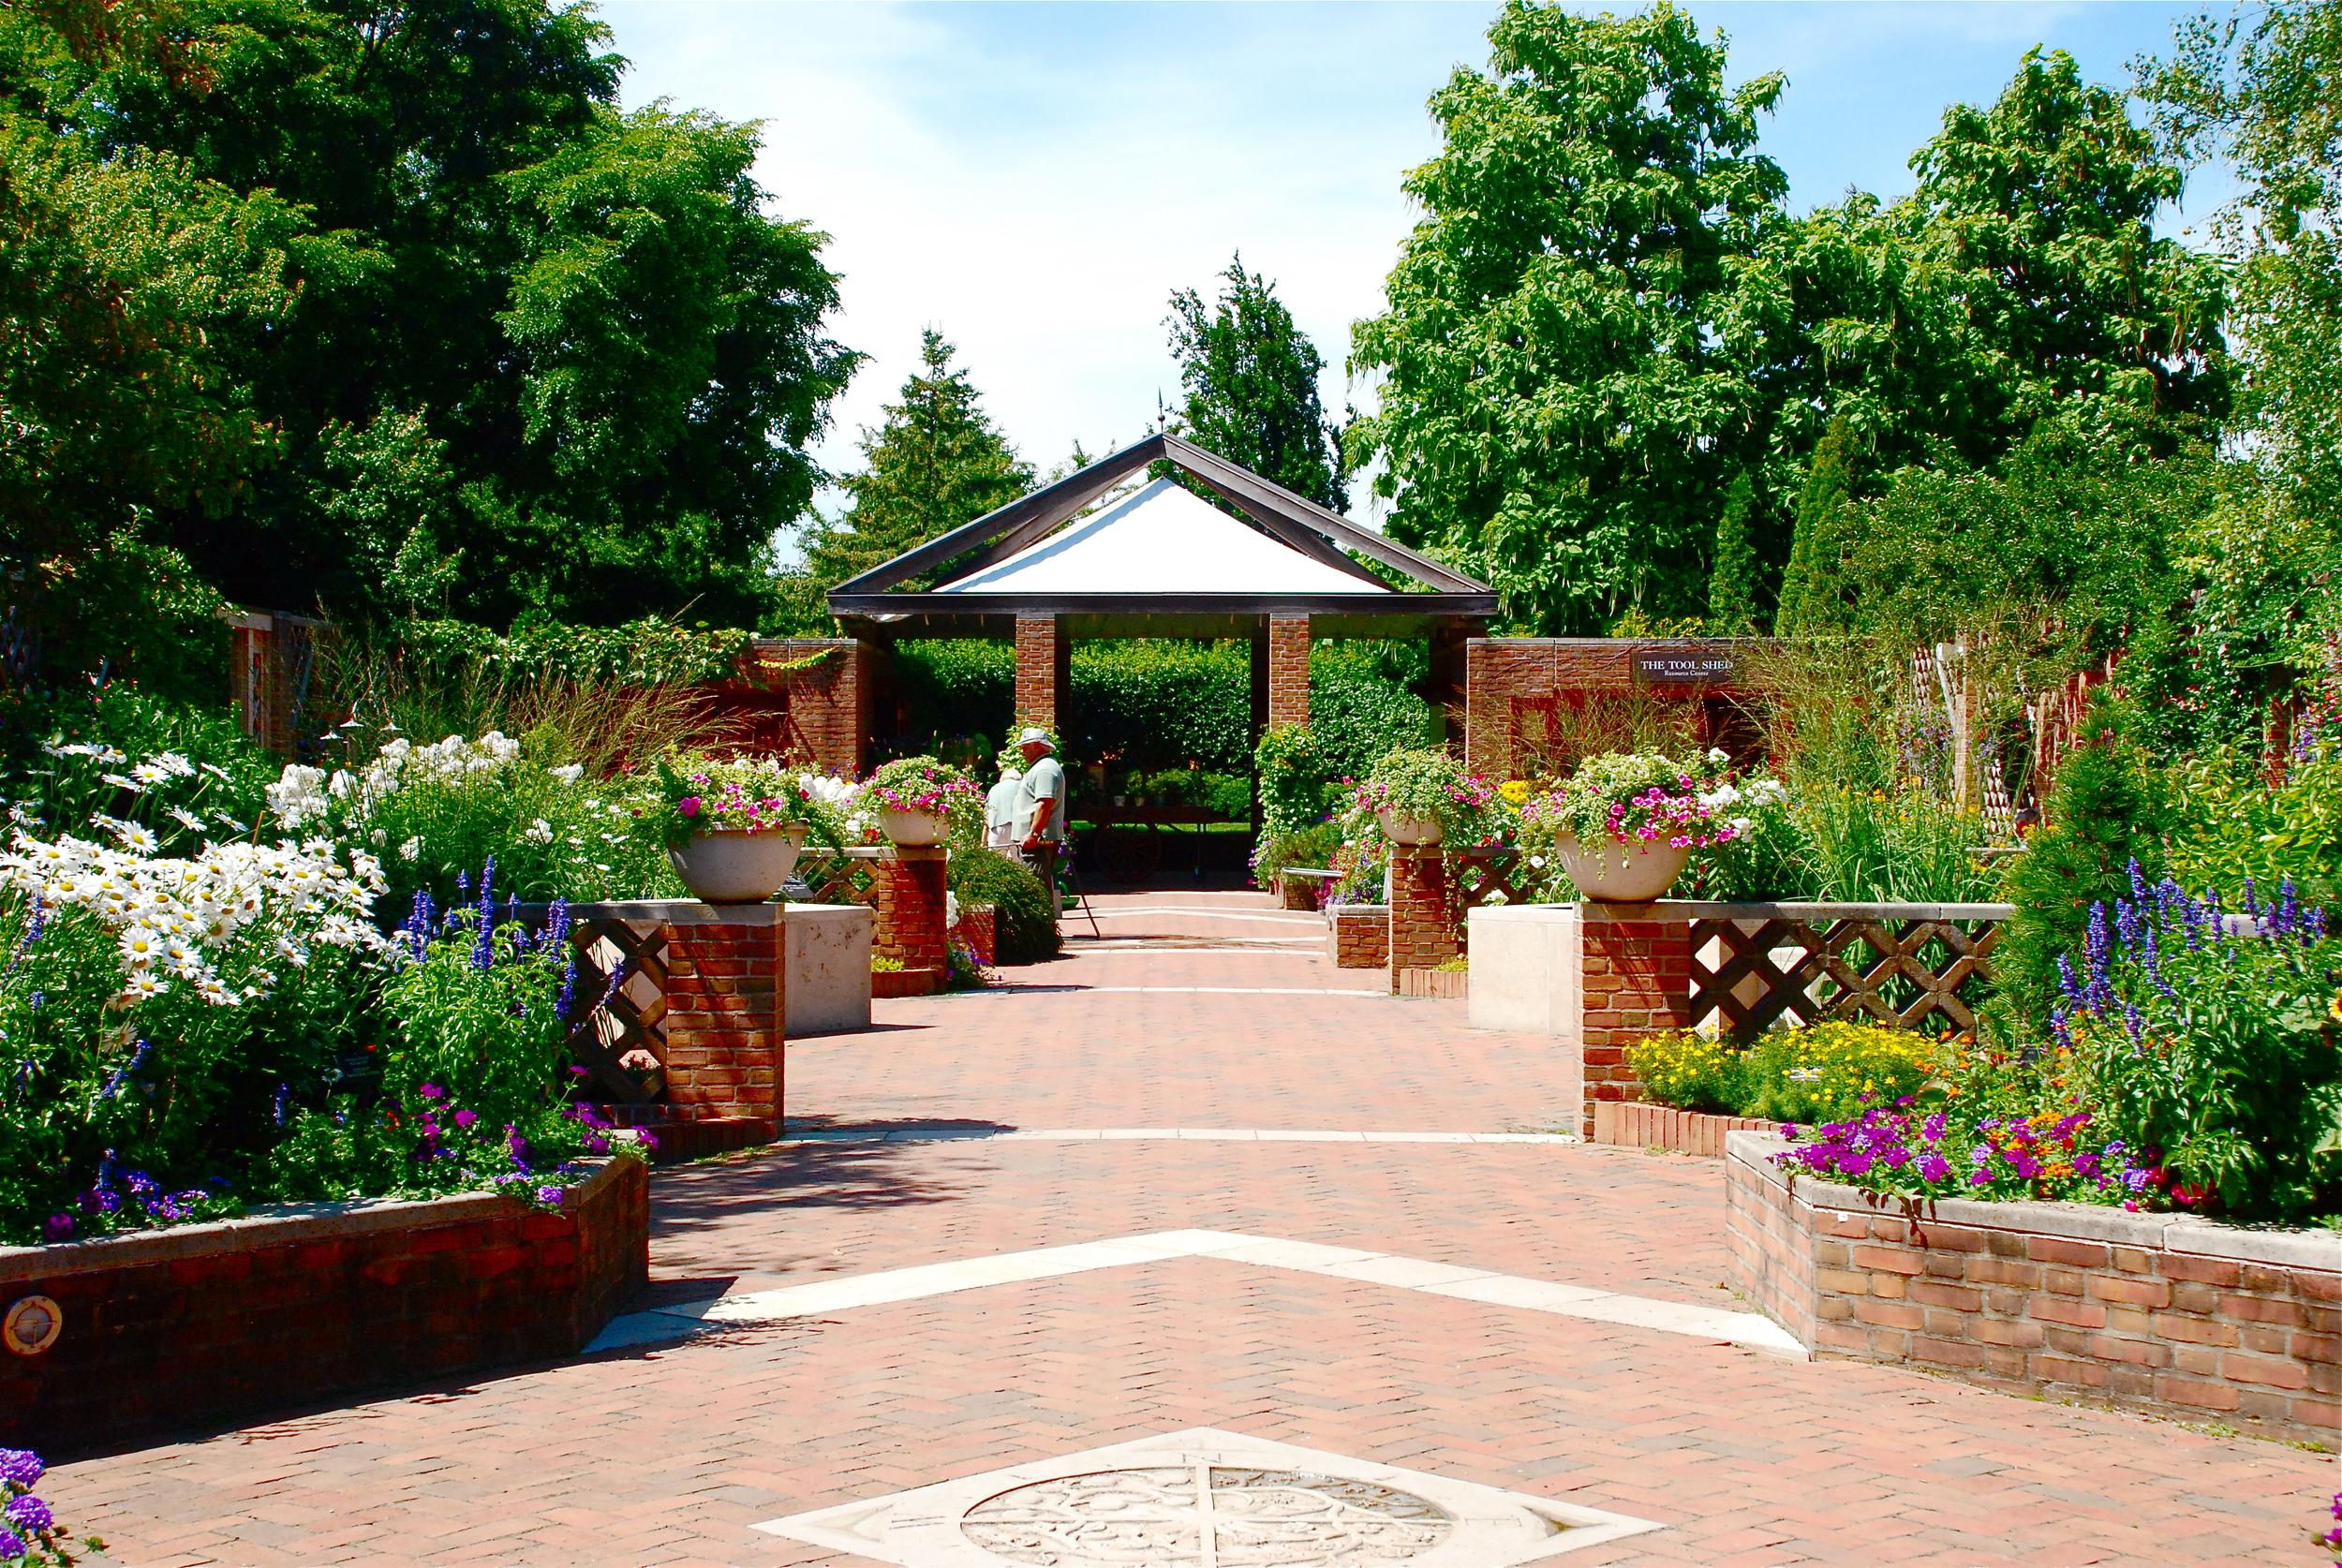 The Buehler Enabling Garden at the Chicago Botanic Garden, Glencoe, Illinois. Kenilworth Garden Club helped establish this importantinstallationat the Chicago Botanic Garden.